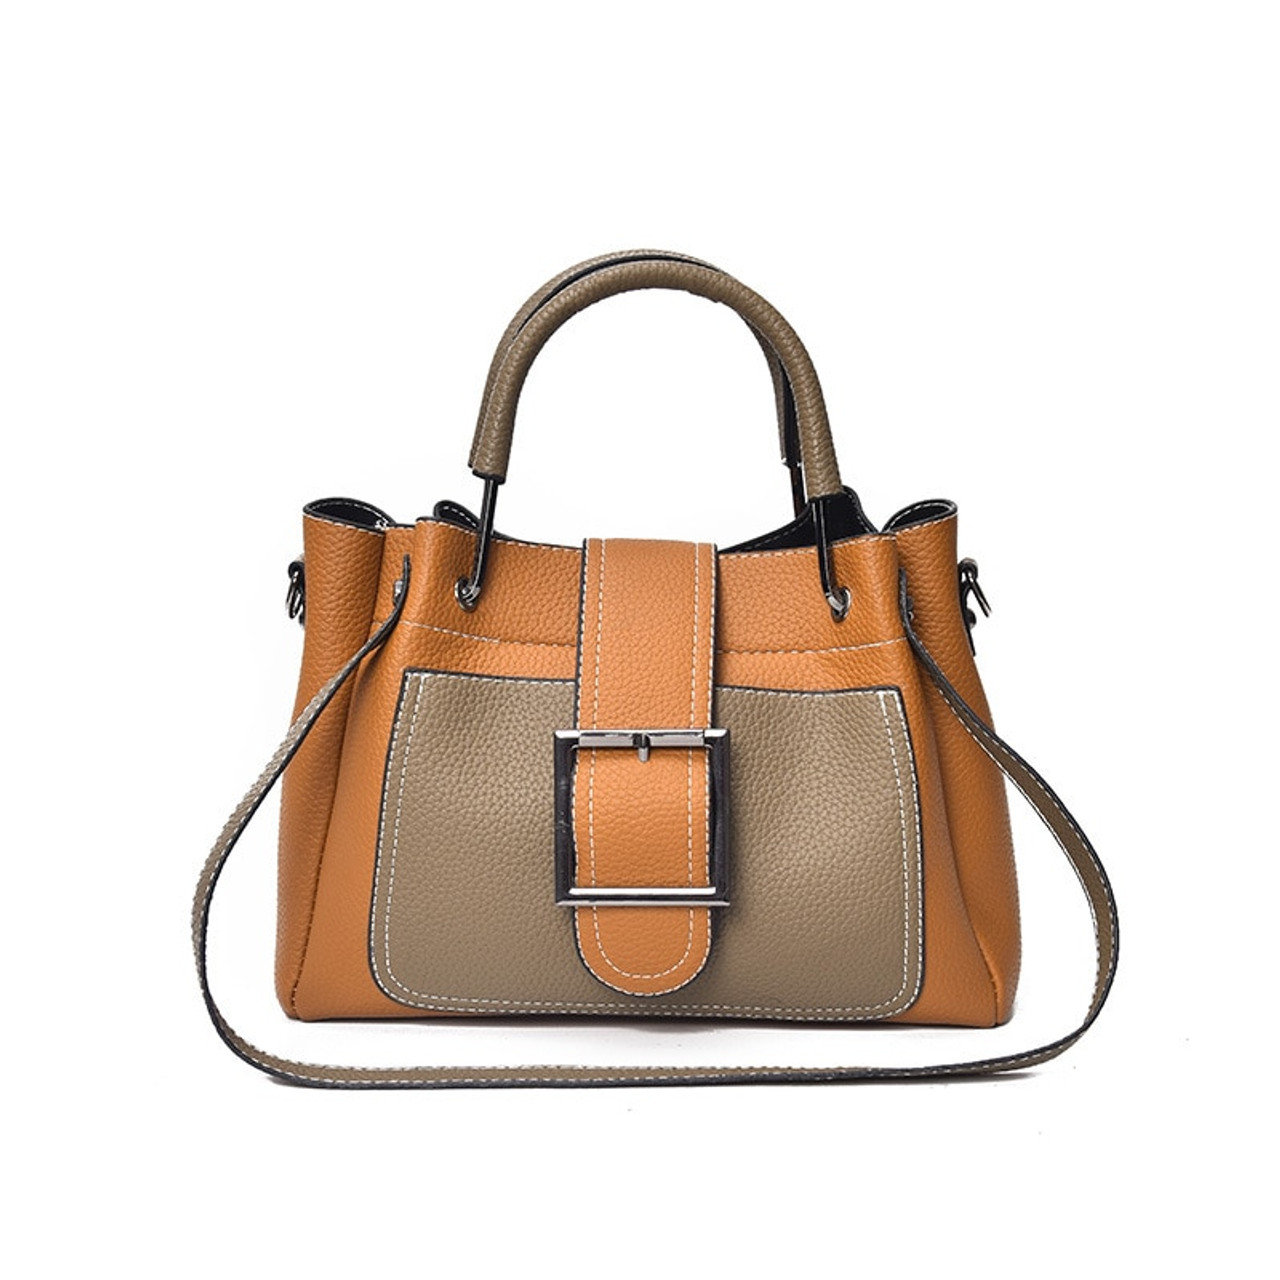 51795a12aa86 ... LANLOU Luxury Handbags Women Shoulder Bag Large Tote Bags Hobo Soft  Leather Ladies Crossbody Messenger Bag ...